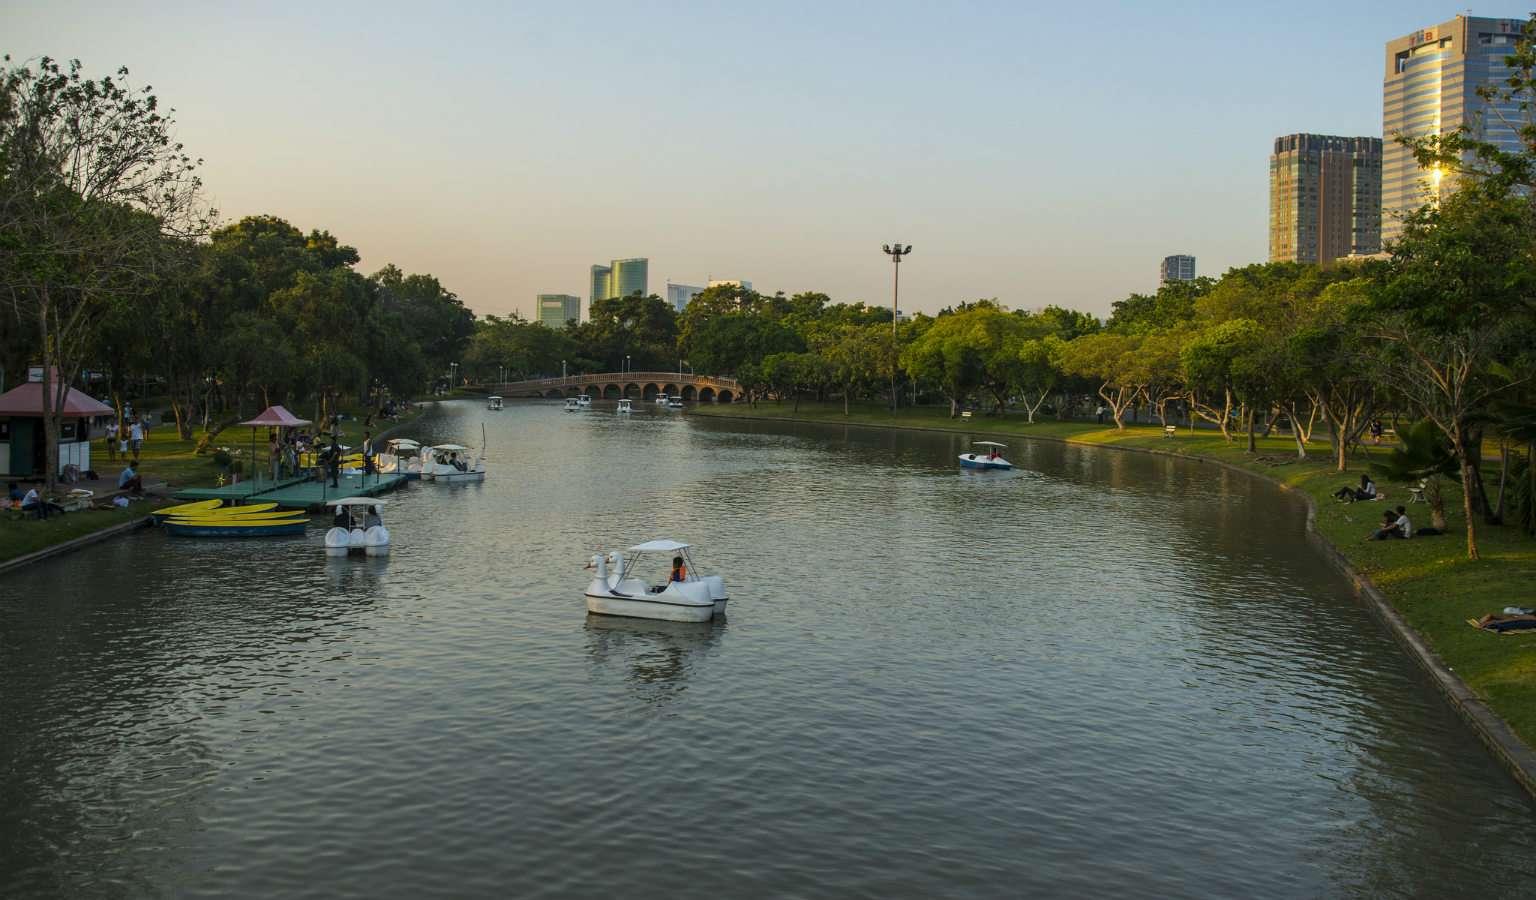 Chatuchak Park in Bangkok Thailand